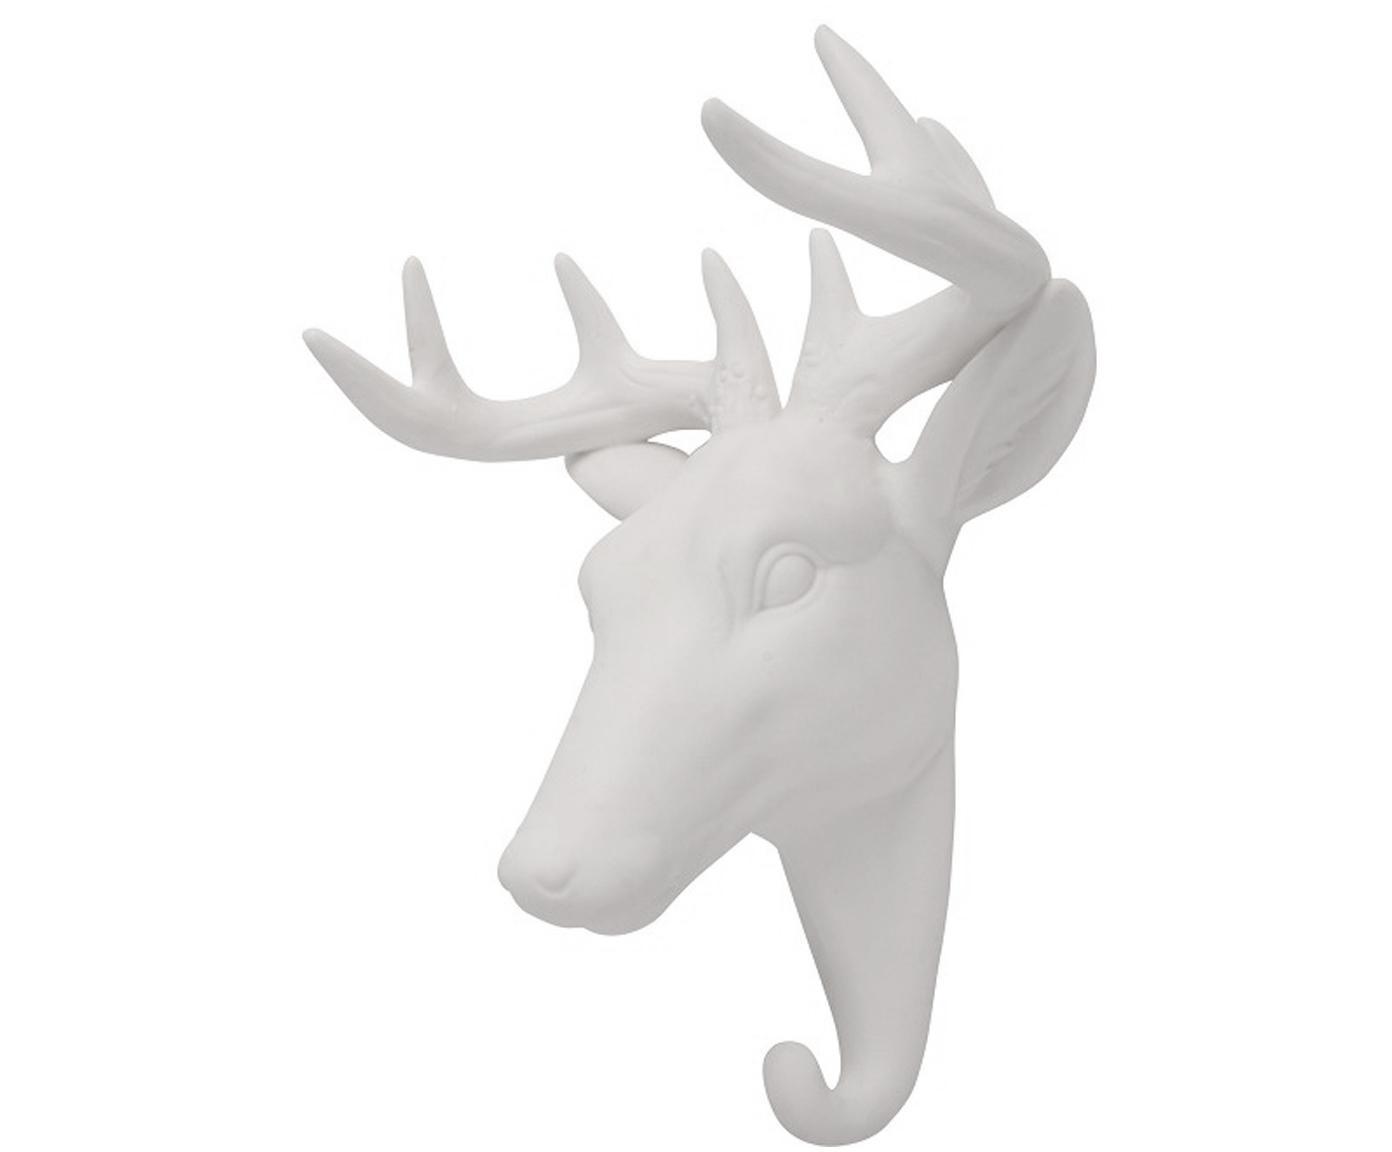 Gancio da parete in porcellana Deer, Porcellana, Bianco, Alt. 16 cm